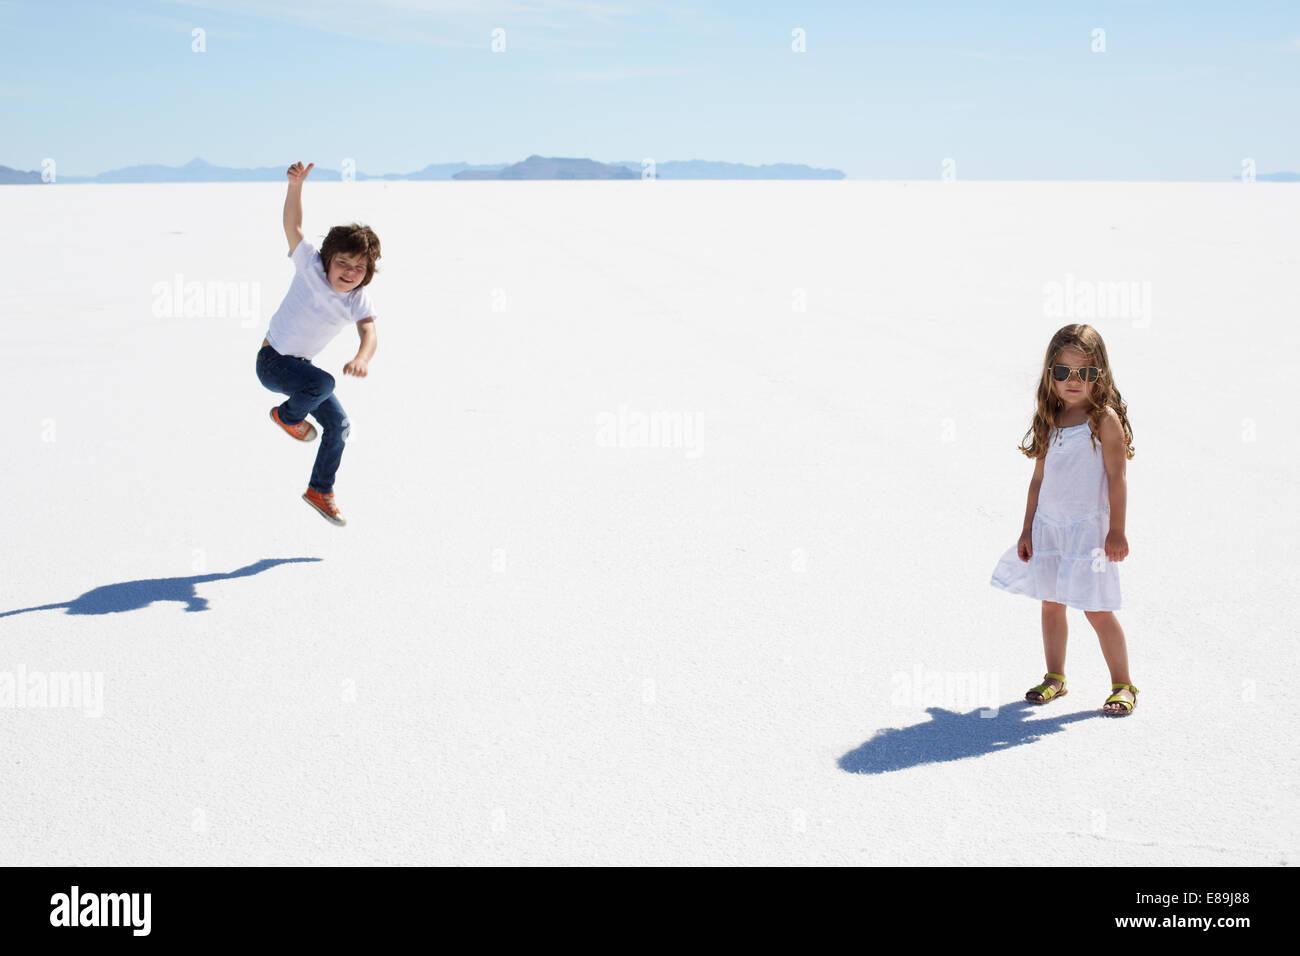 Kids at the Bonneville Salt Flats - Stock Image